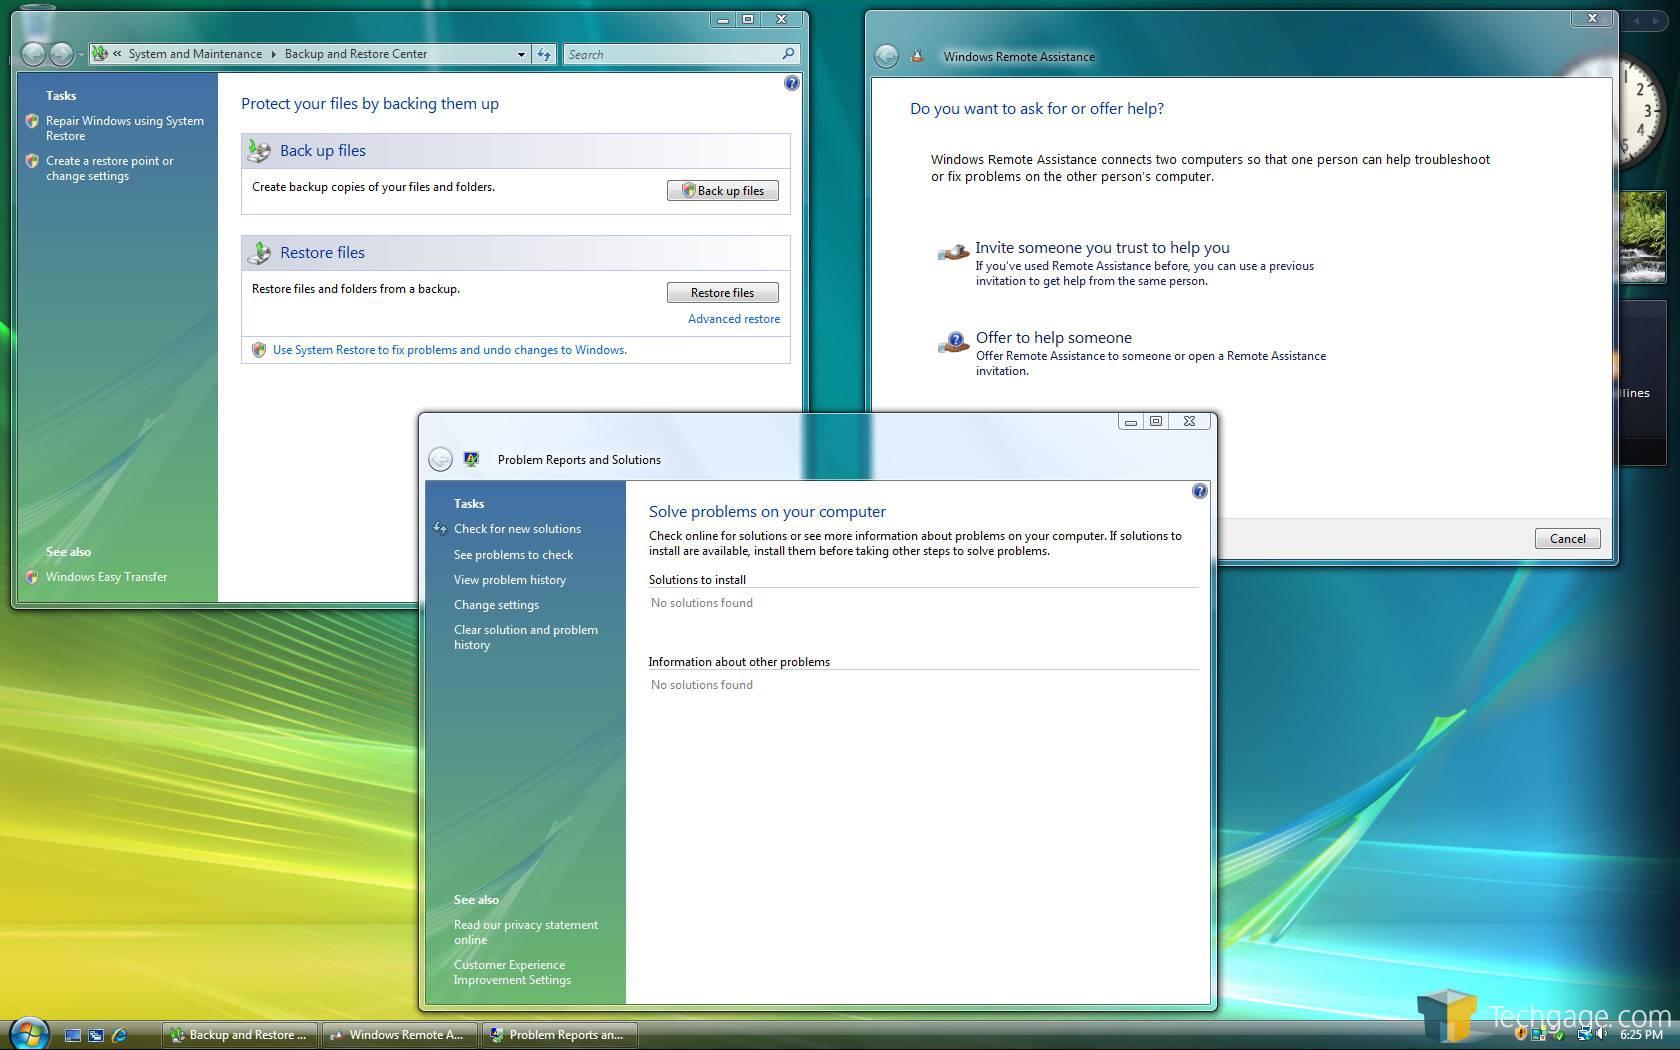 <span><b class=sec>Windows</b> help for <b class=sec>vista</b> <b class=sec>iso</b> <b class=sec>image</b> : joedcuso.eu</span>